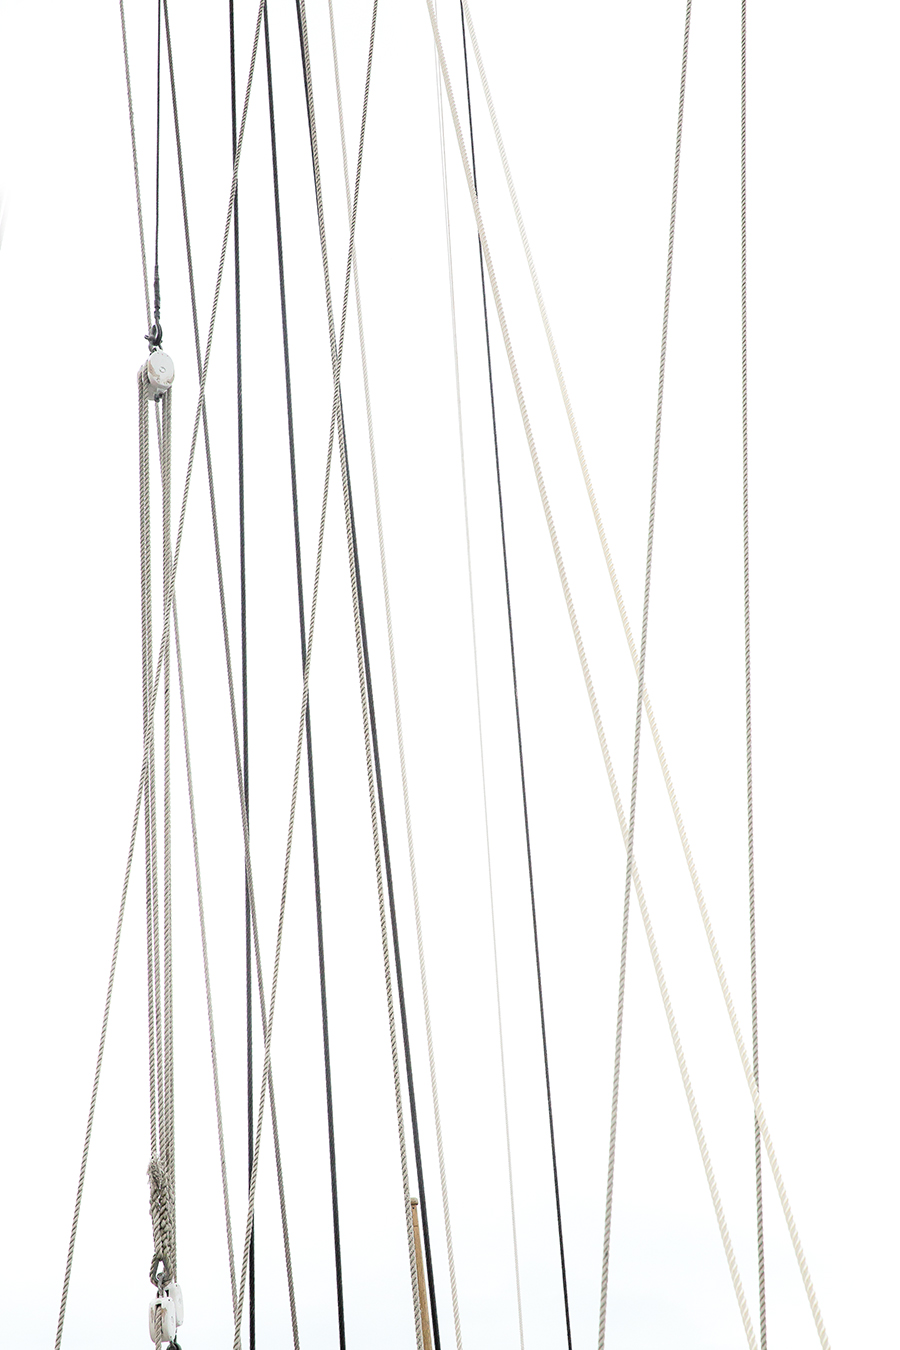 ropes(WEB).jpg